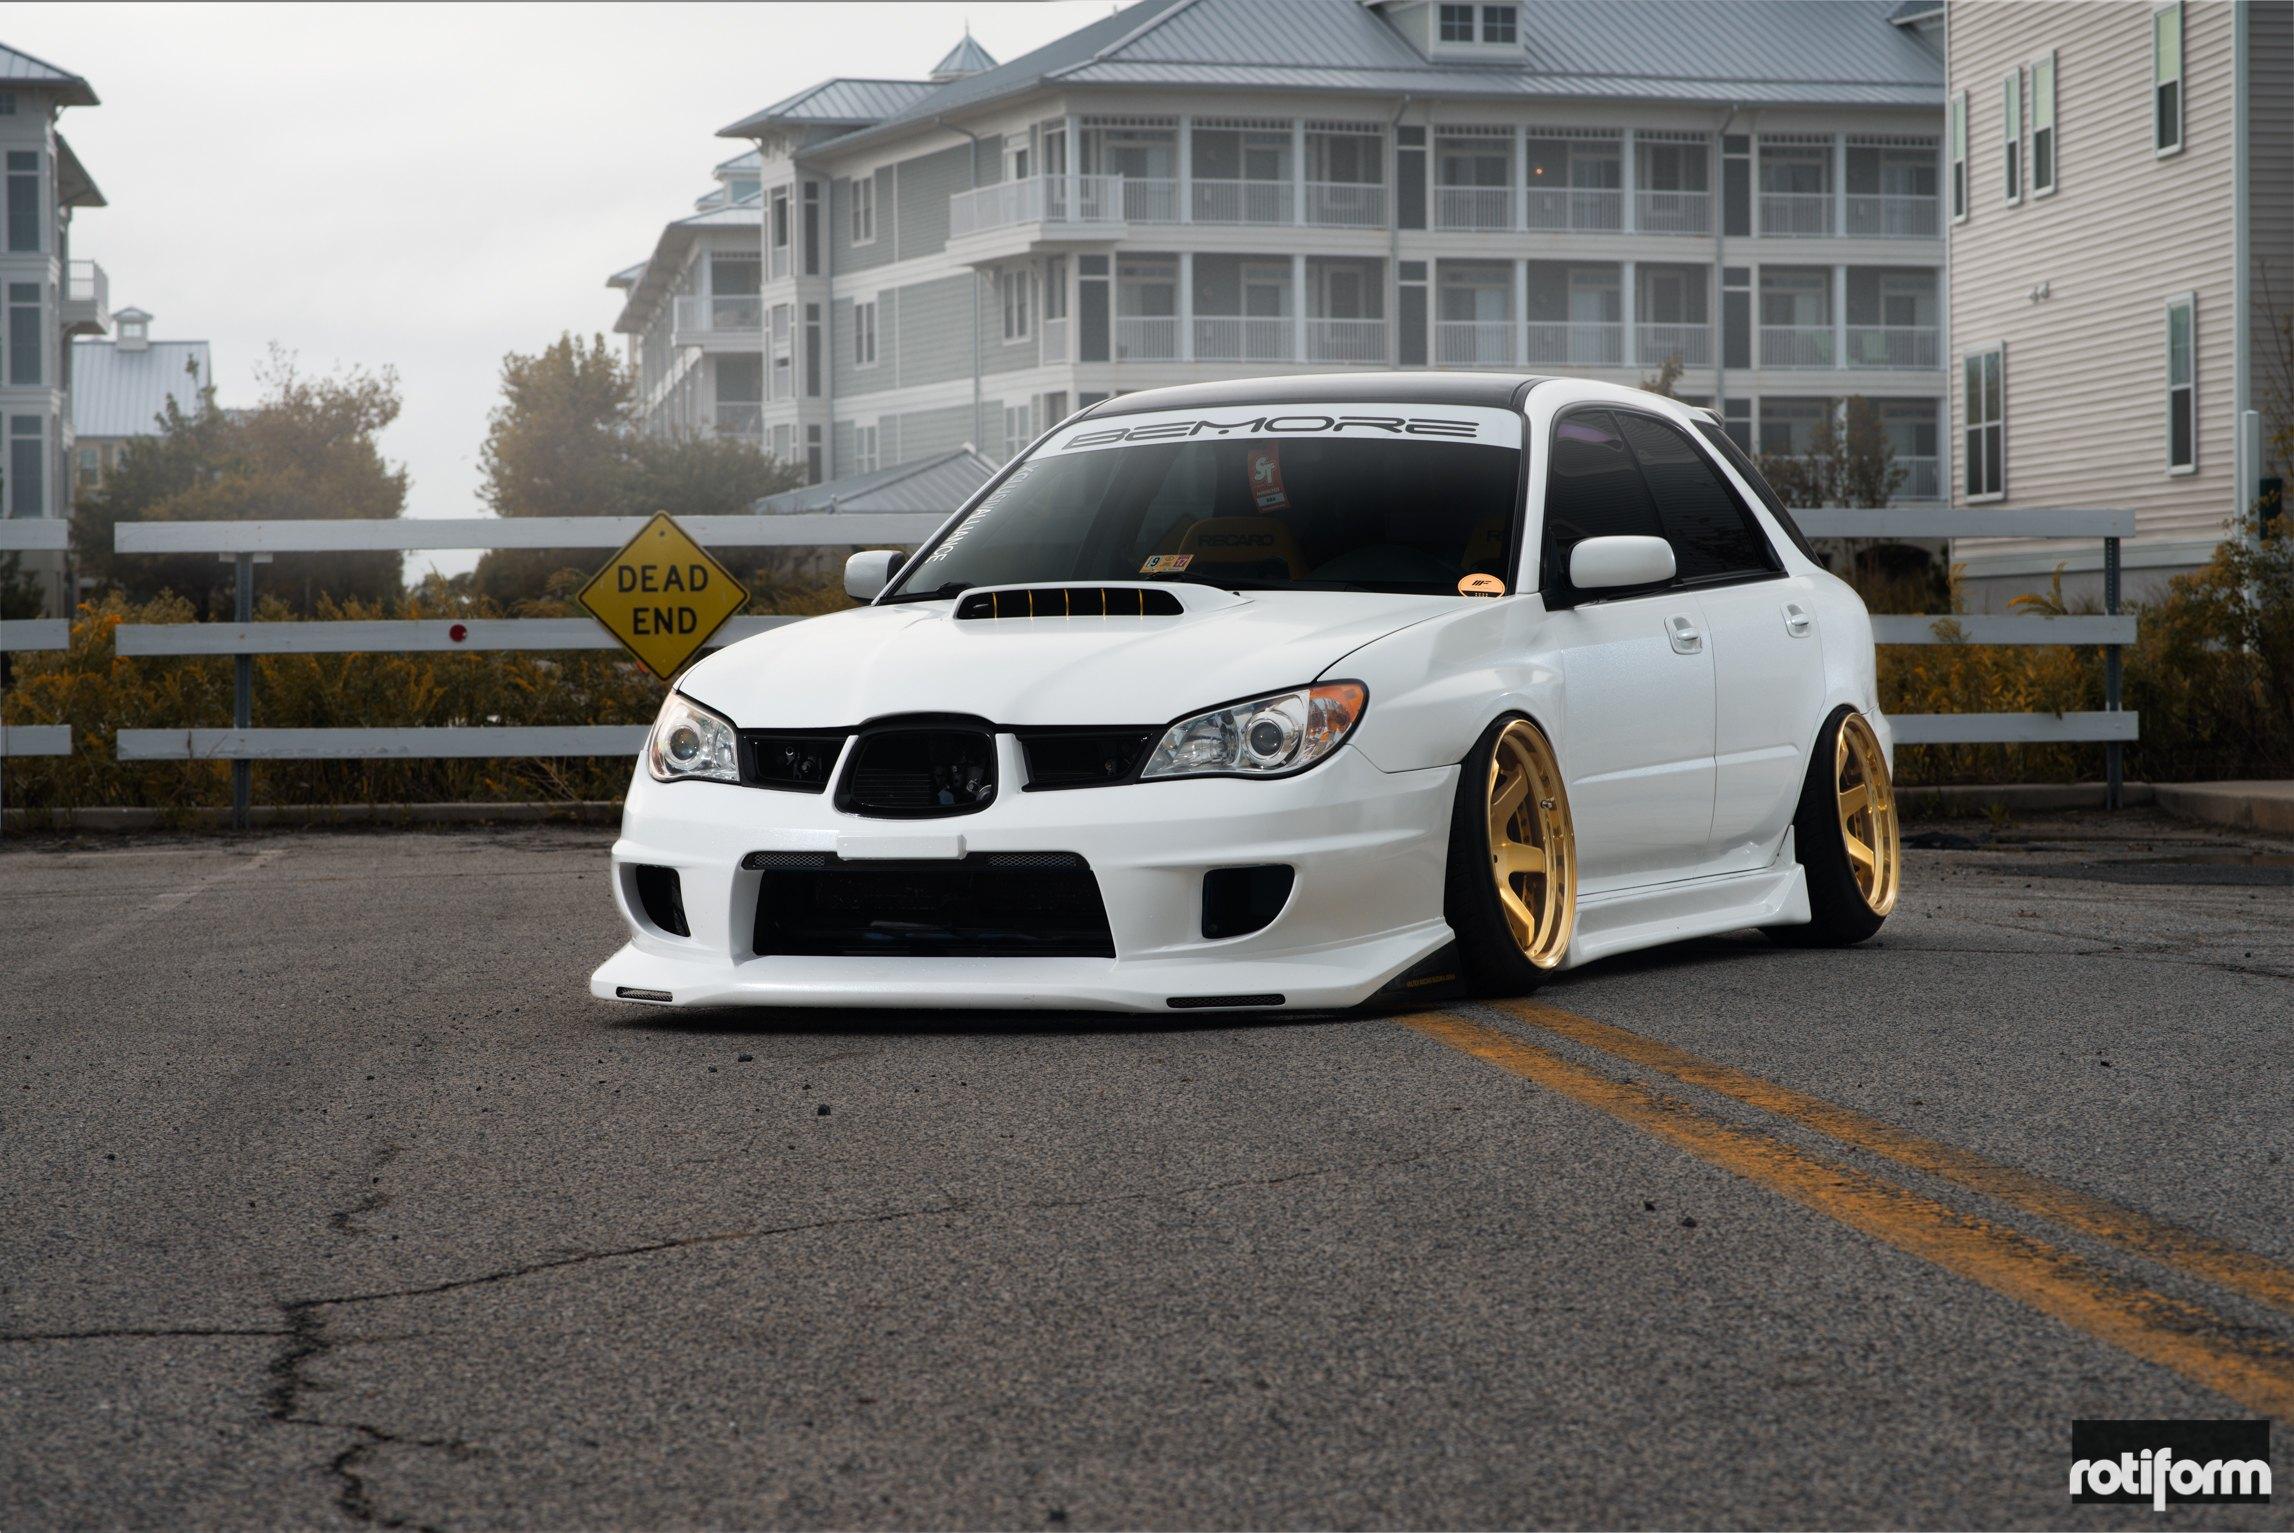 100 White Subaru Wrx 18x9 5 Wheels